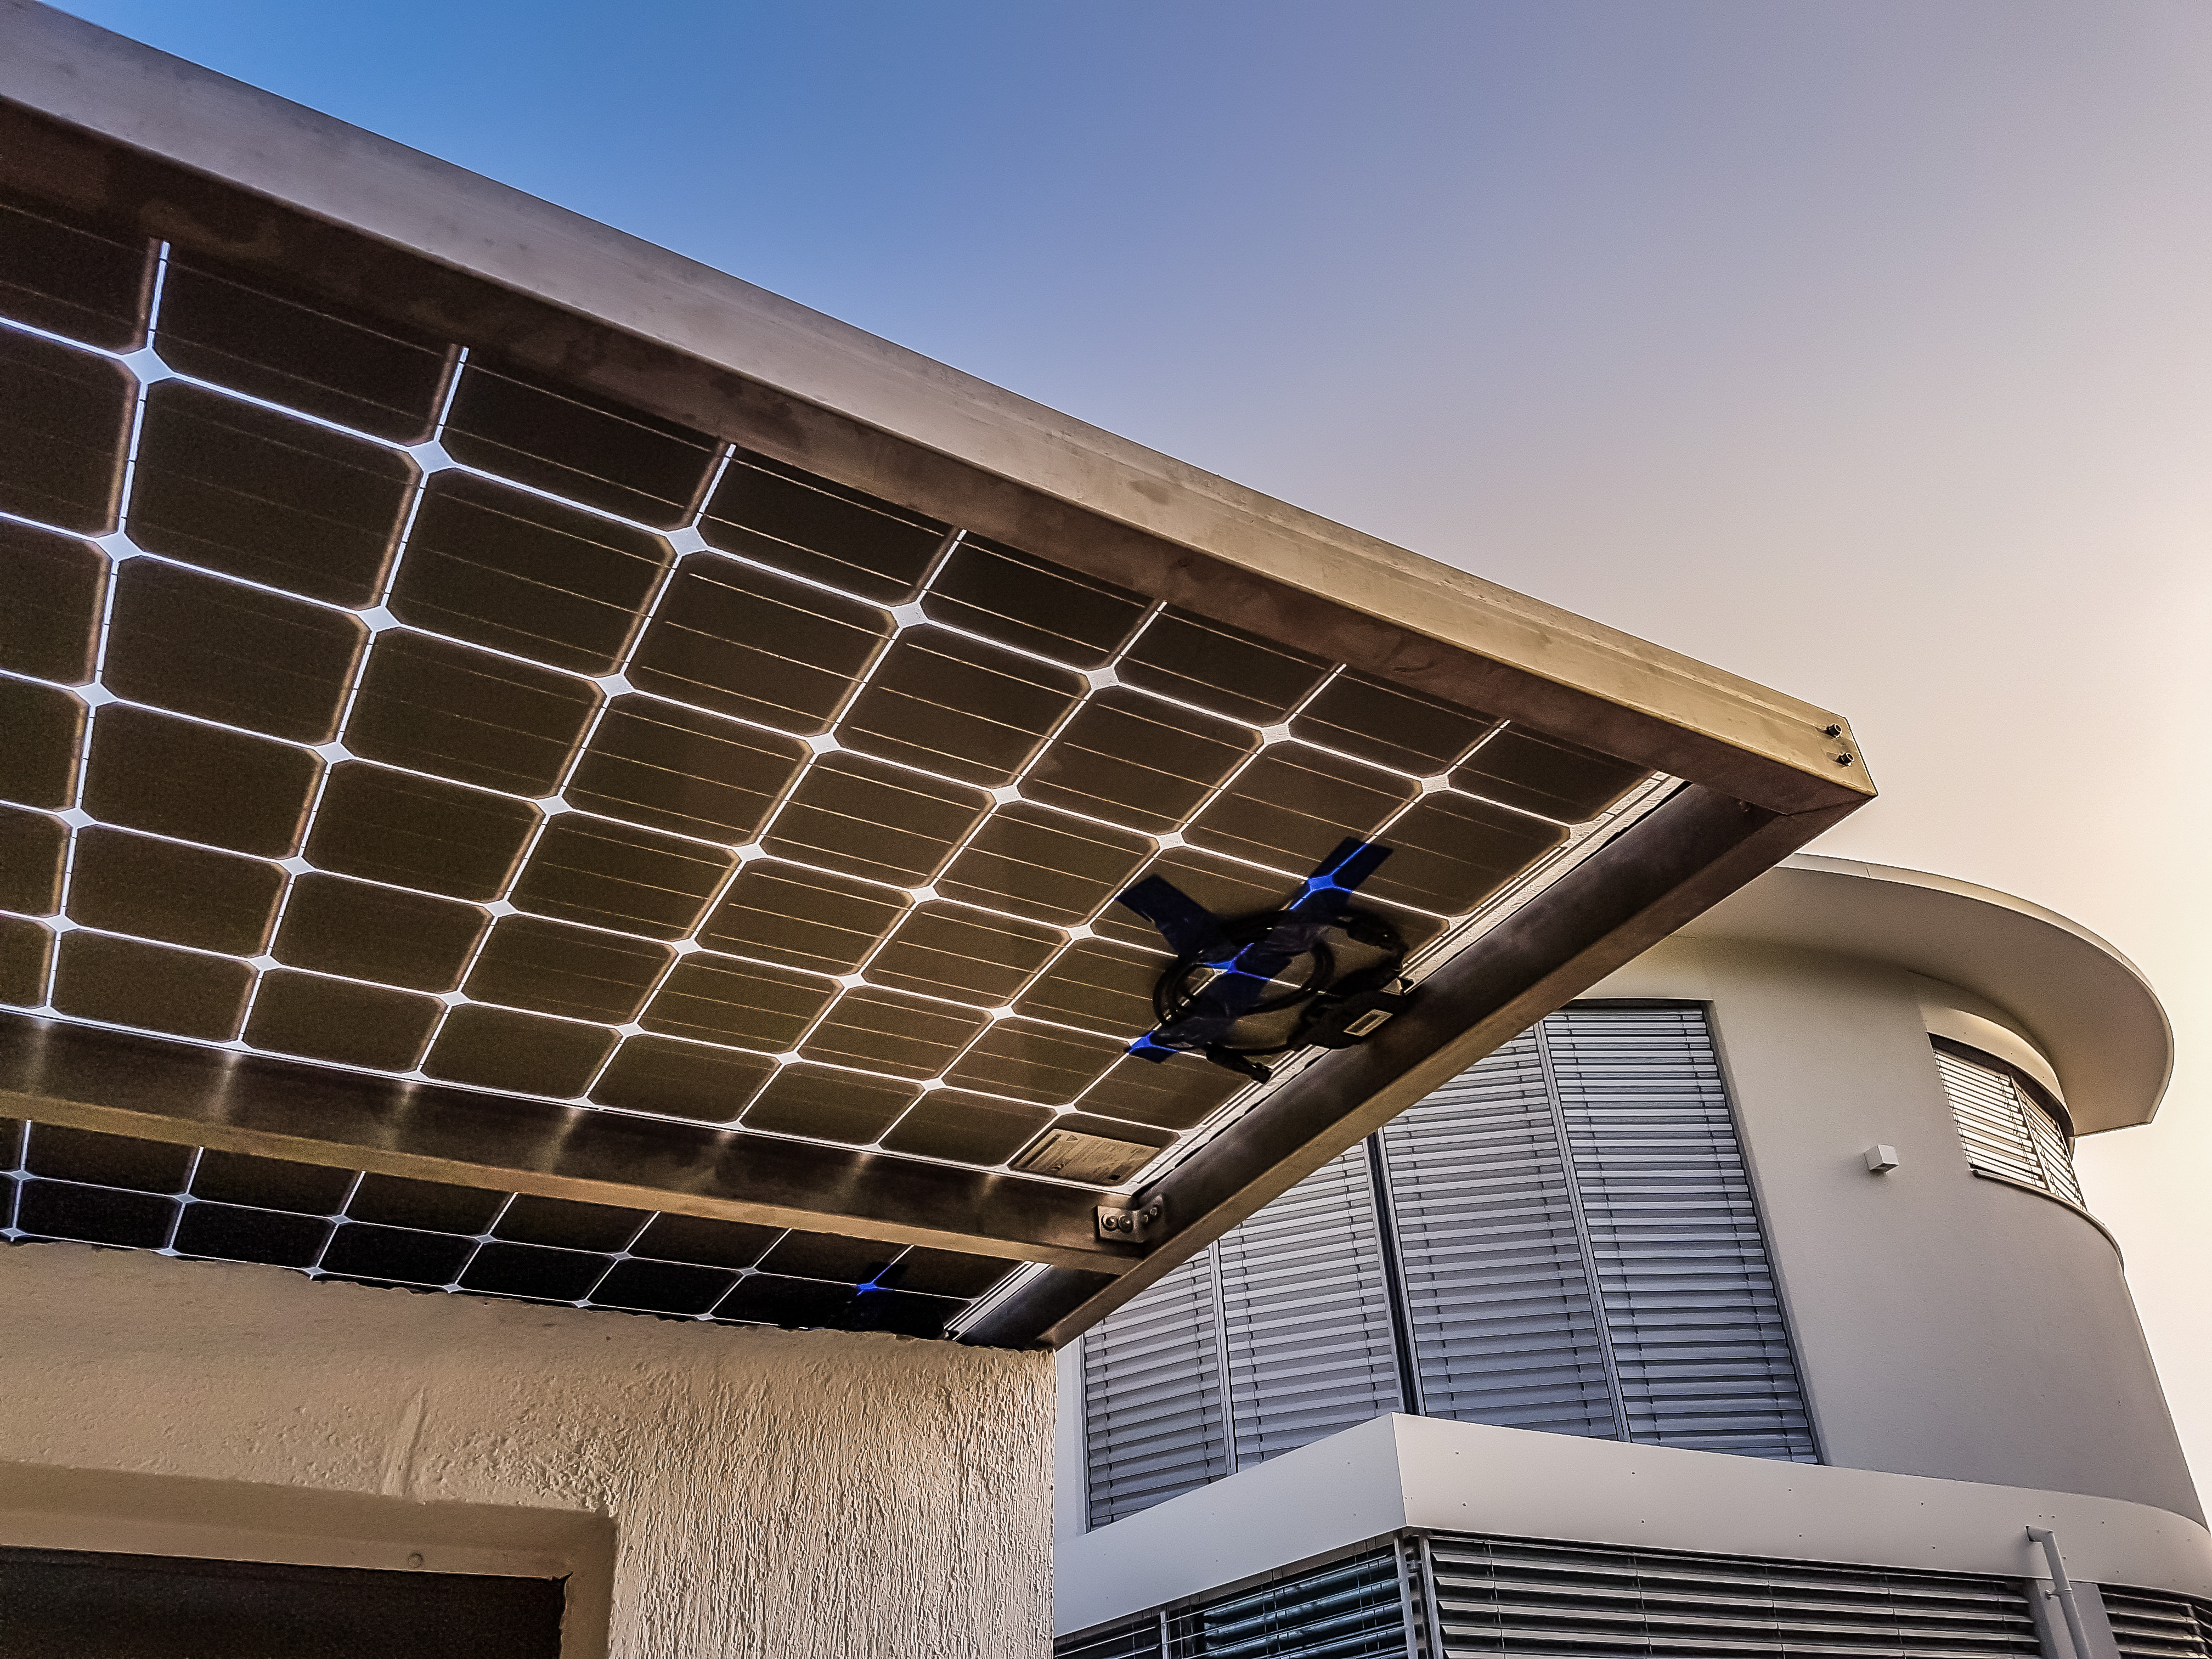 Solarmodule lassen sich in den modernen Hausbau perfekt integrieren